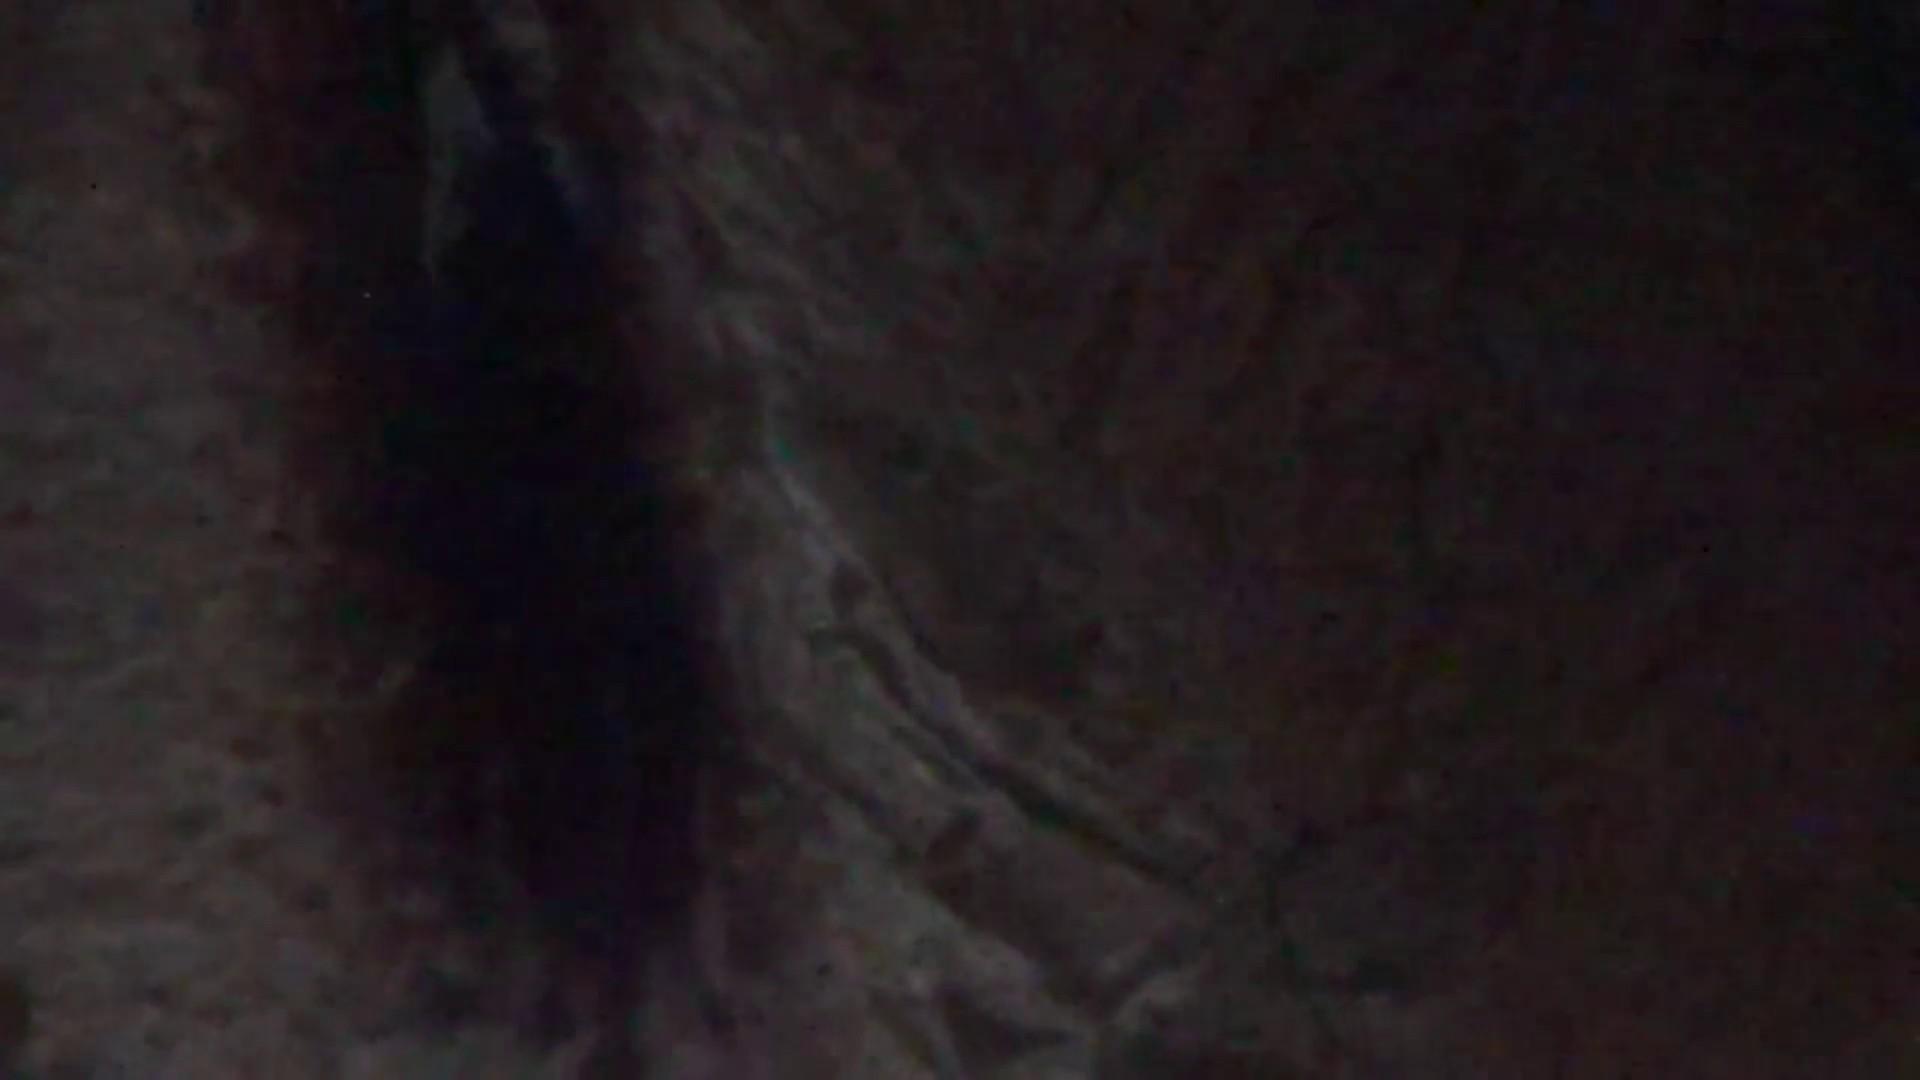 JD盗撮 美女の洗面所の秘密 Vol.44 洗面所 盗撮AV動画キャプチャ 98pic 53